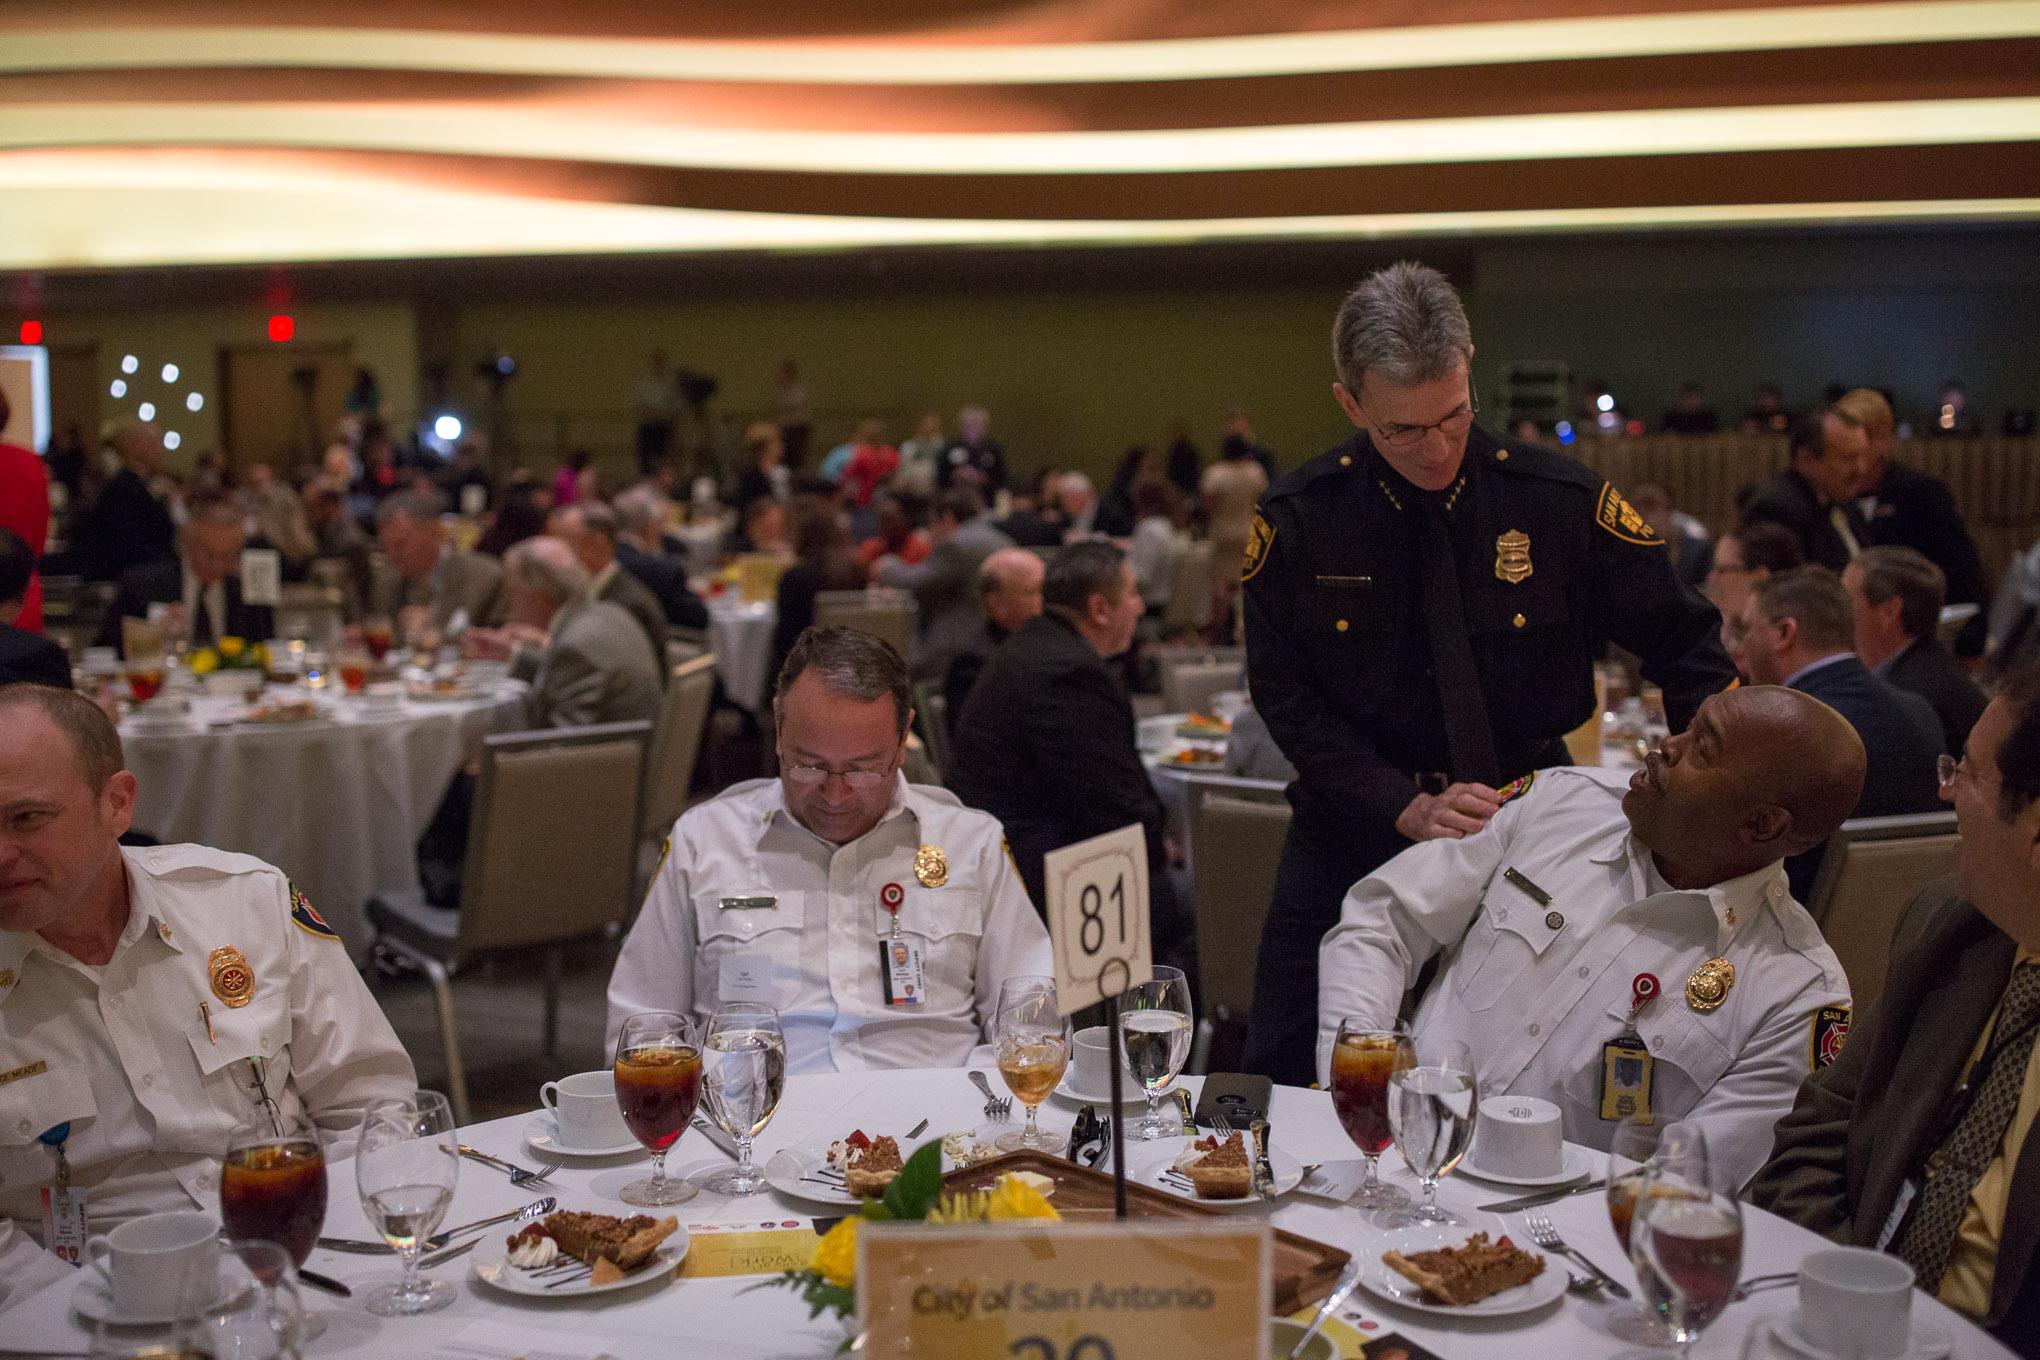 San Antonio Chief of Police William McManus greets San Antonio Fire Department Chief Charles Hood. Photo by Scott Ball.